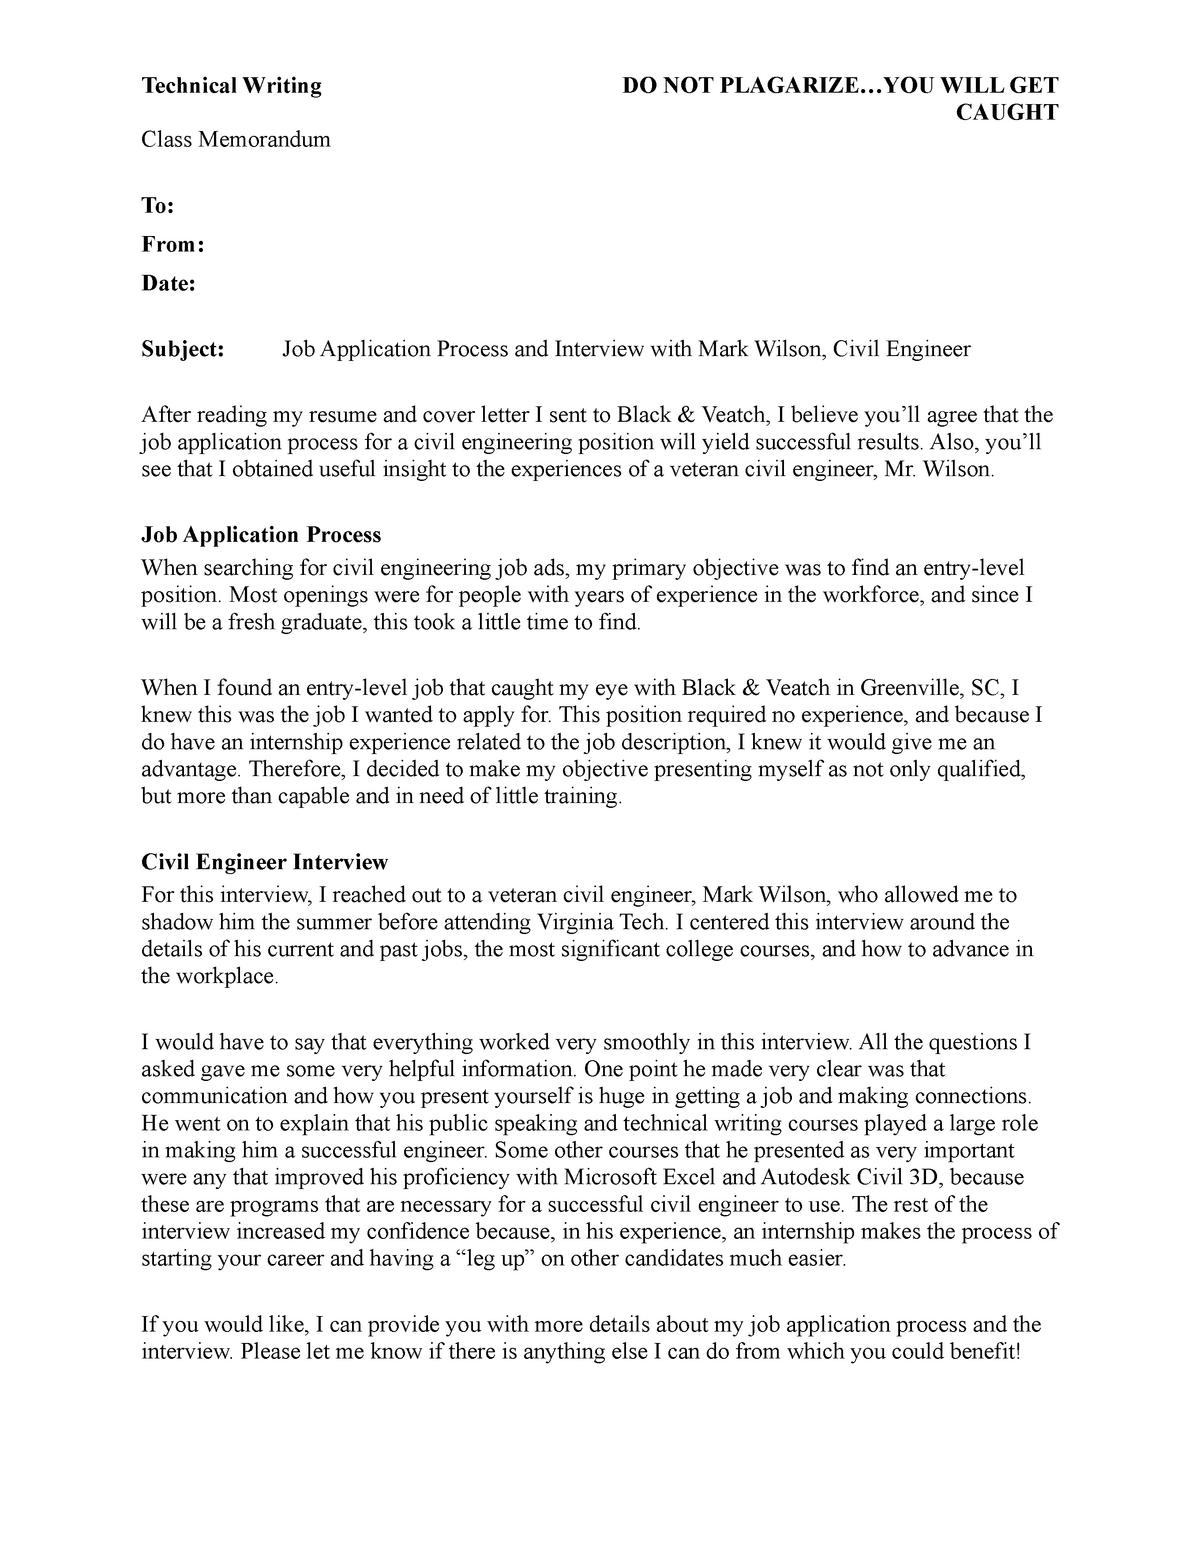 Job Packet Memo - Reece Williams - ENGL3764 - Virginia Tech